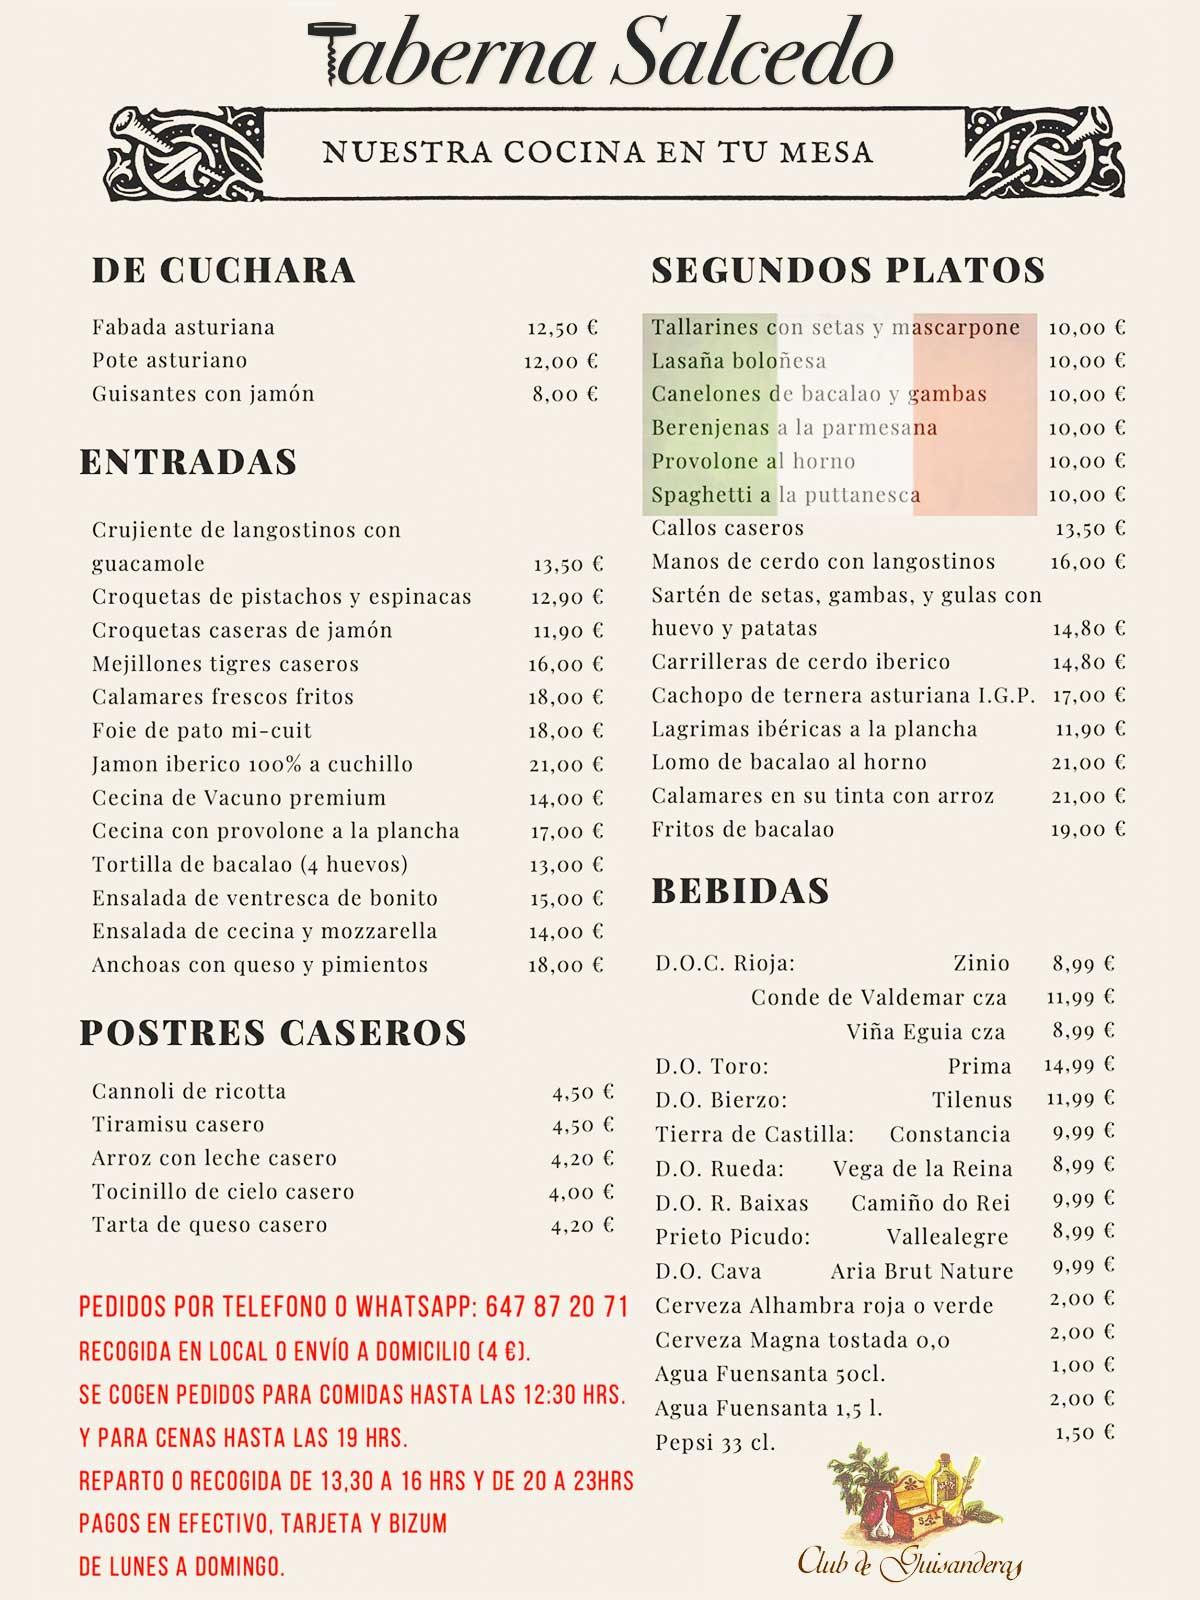 carta-delivery-taberna-salcedo-03